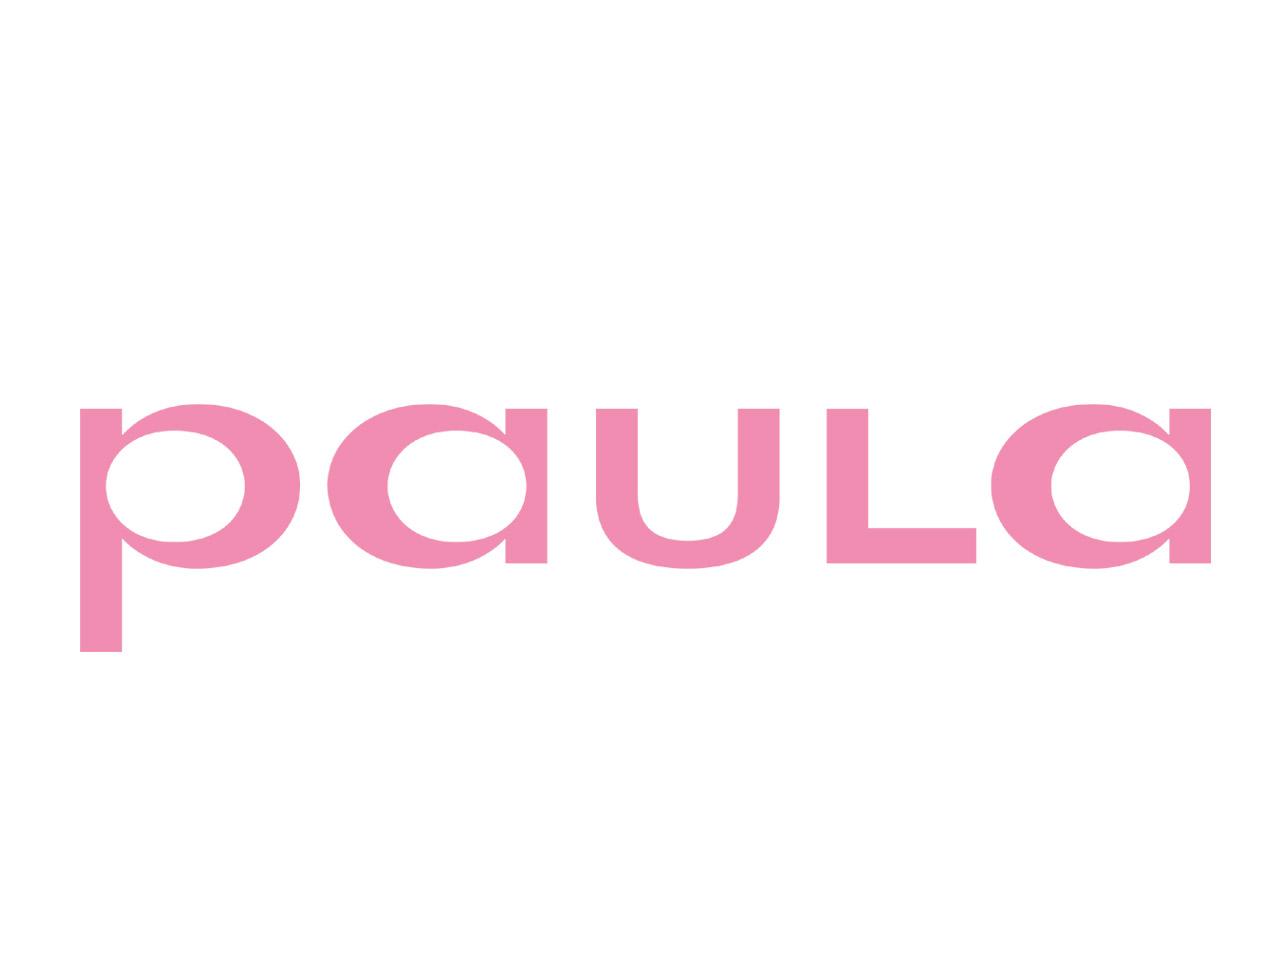 PAULA Logo/CI development